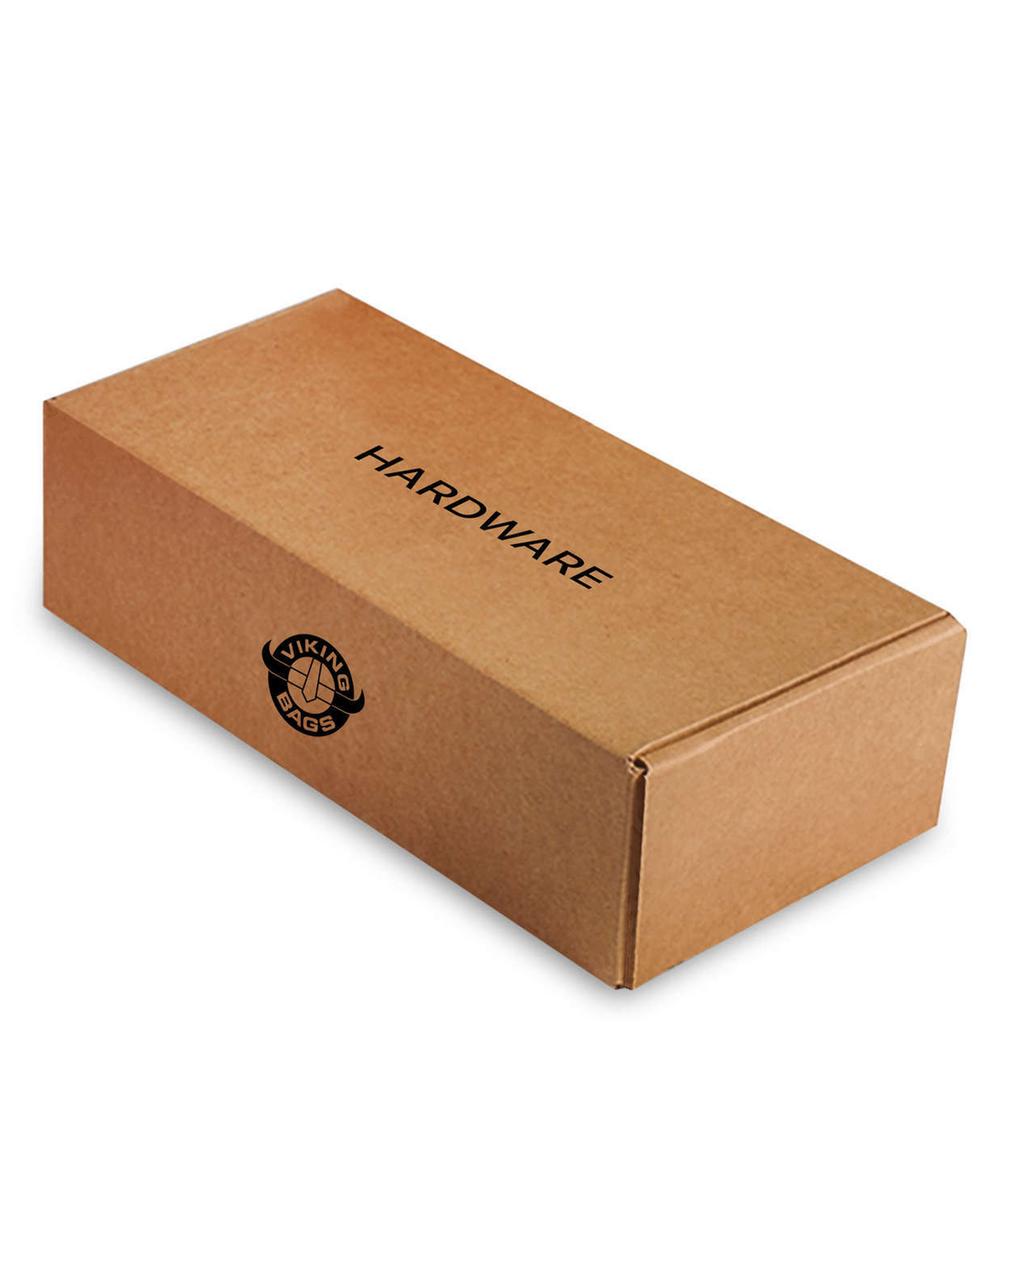 Honda VTX 1800 S Pinnacle Studded Motorcycle Saddlebags Box